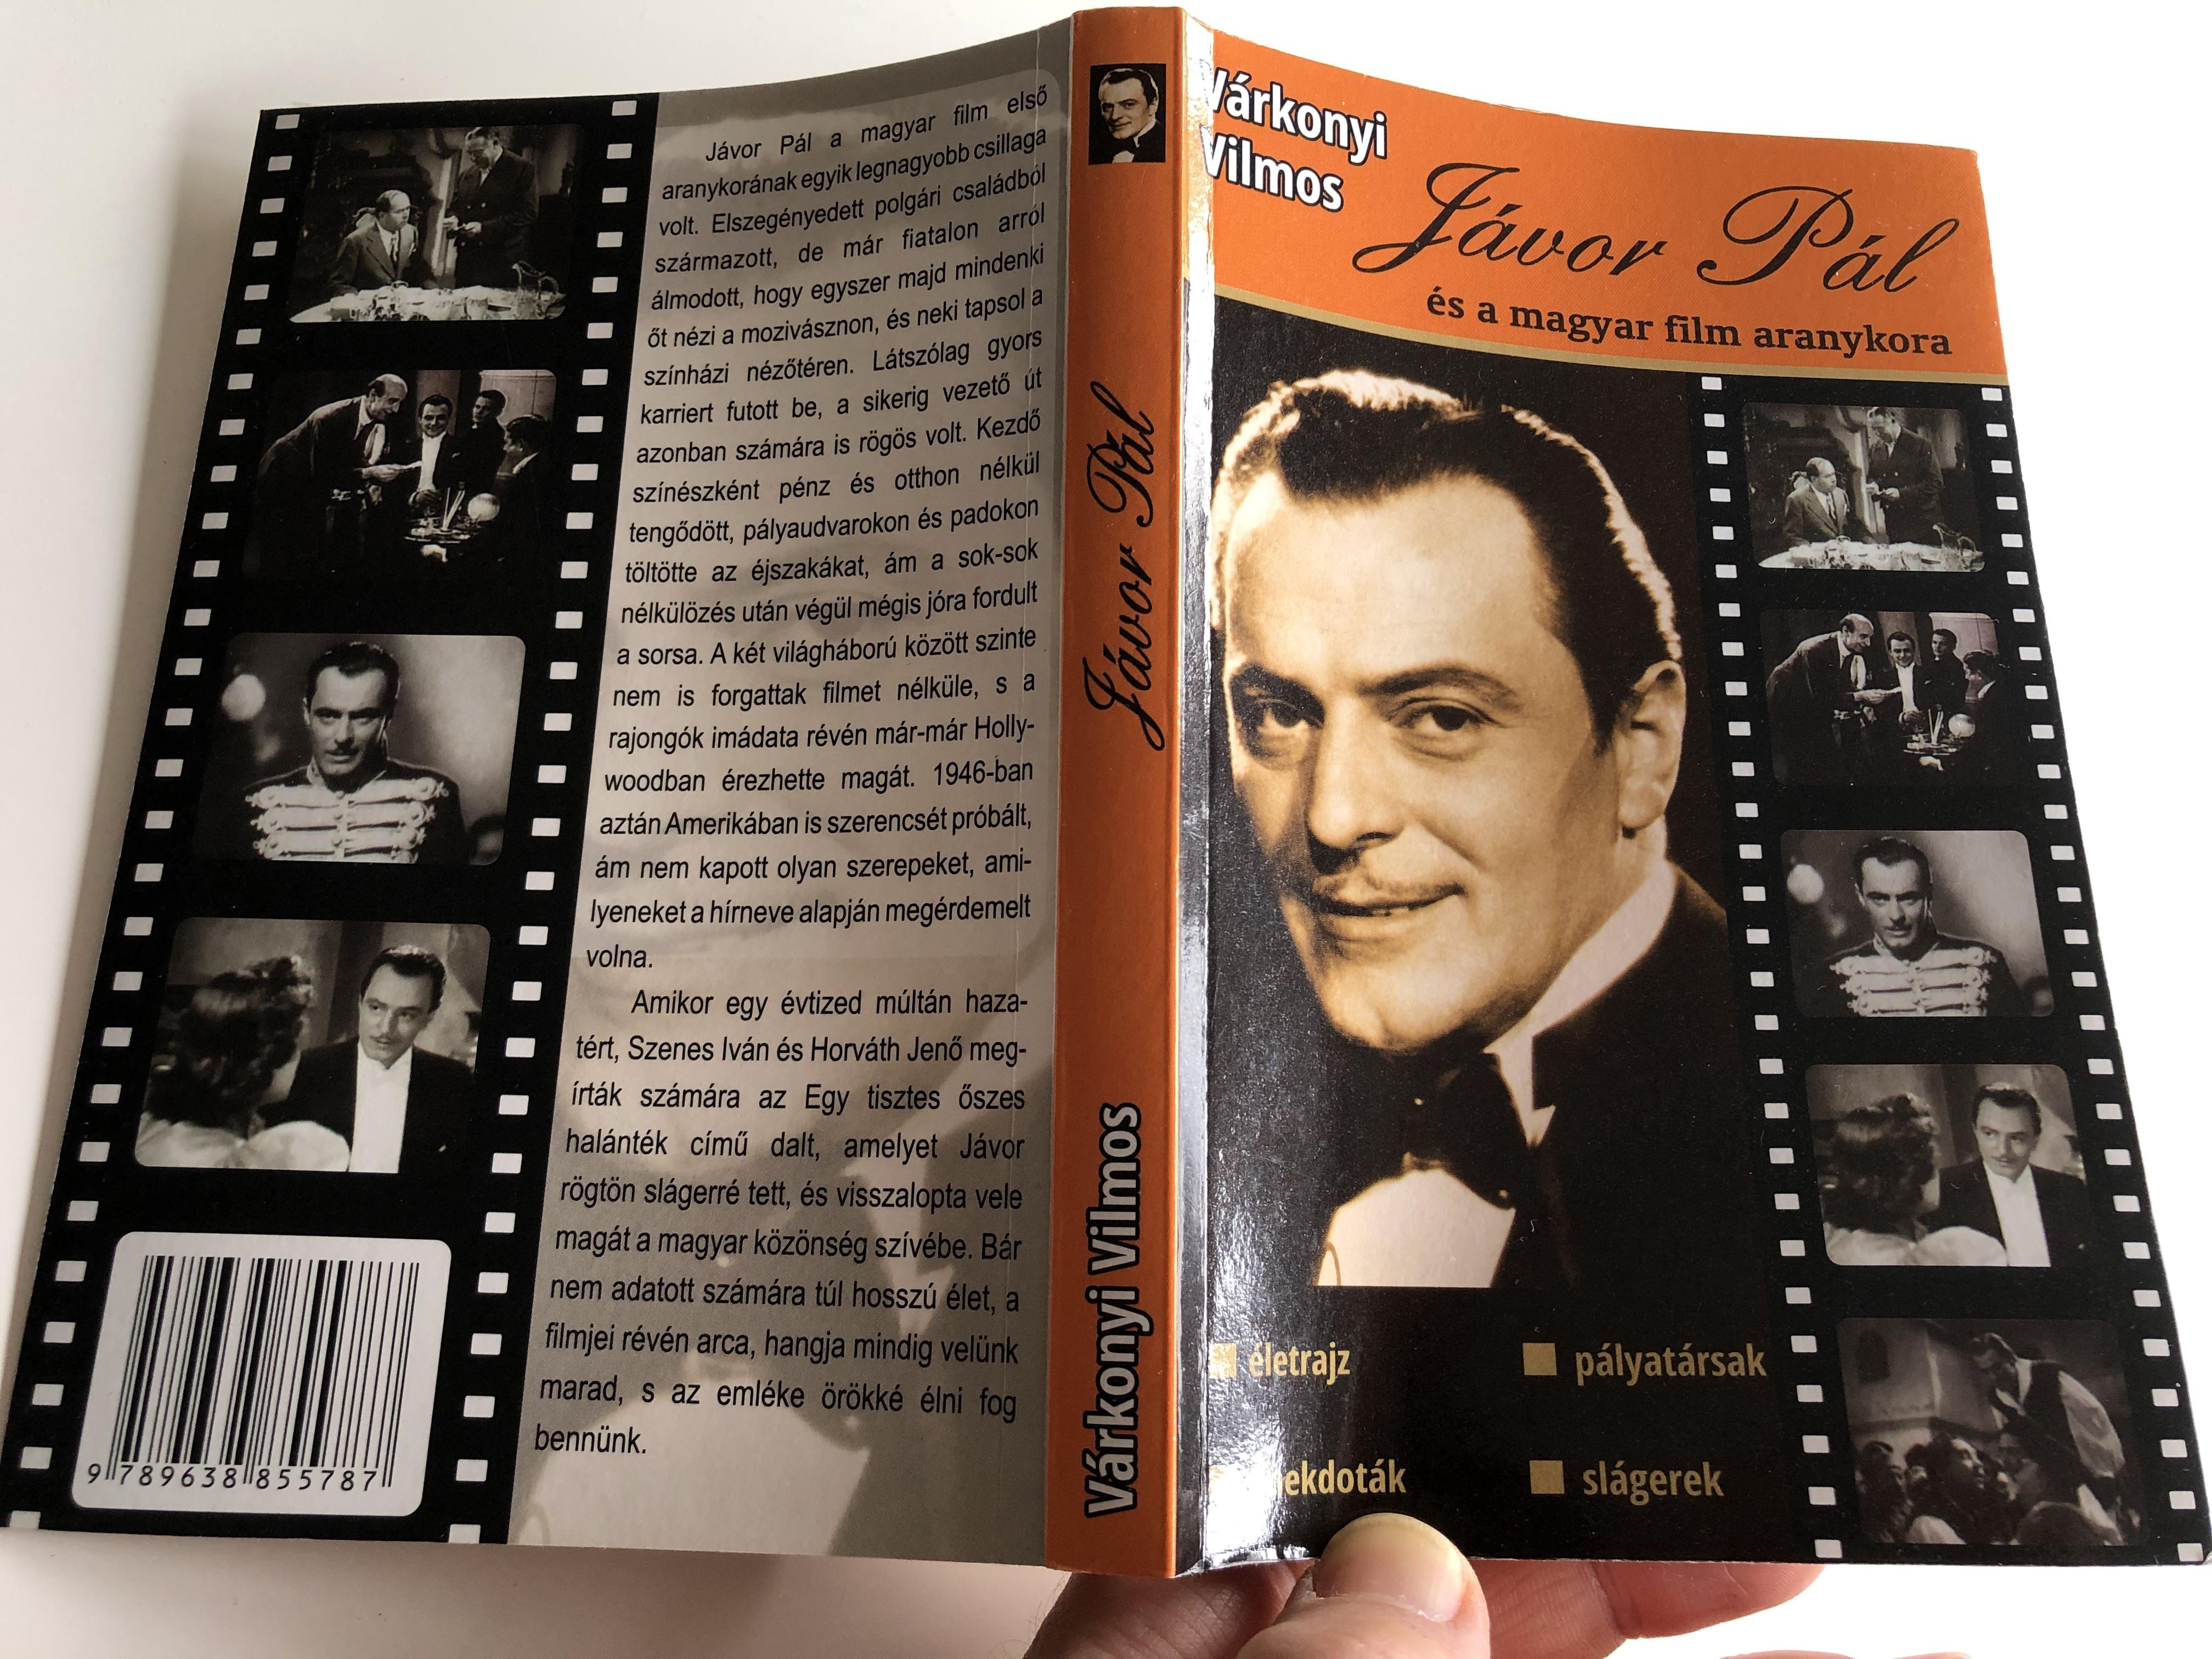 j-vor-p-l-s-a-magyar-film-aranykora-by-v-rkonyi-vilmos-letrajz-anekdot-k-p-lyat-rsak-sl-gerek-12.jpg